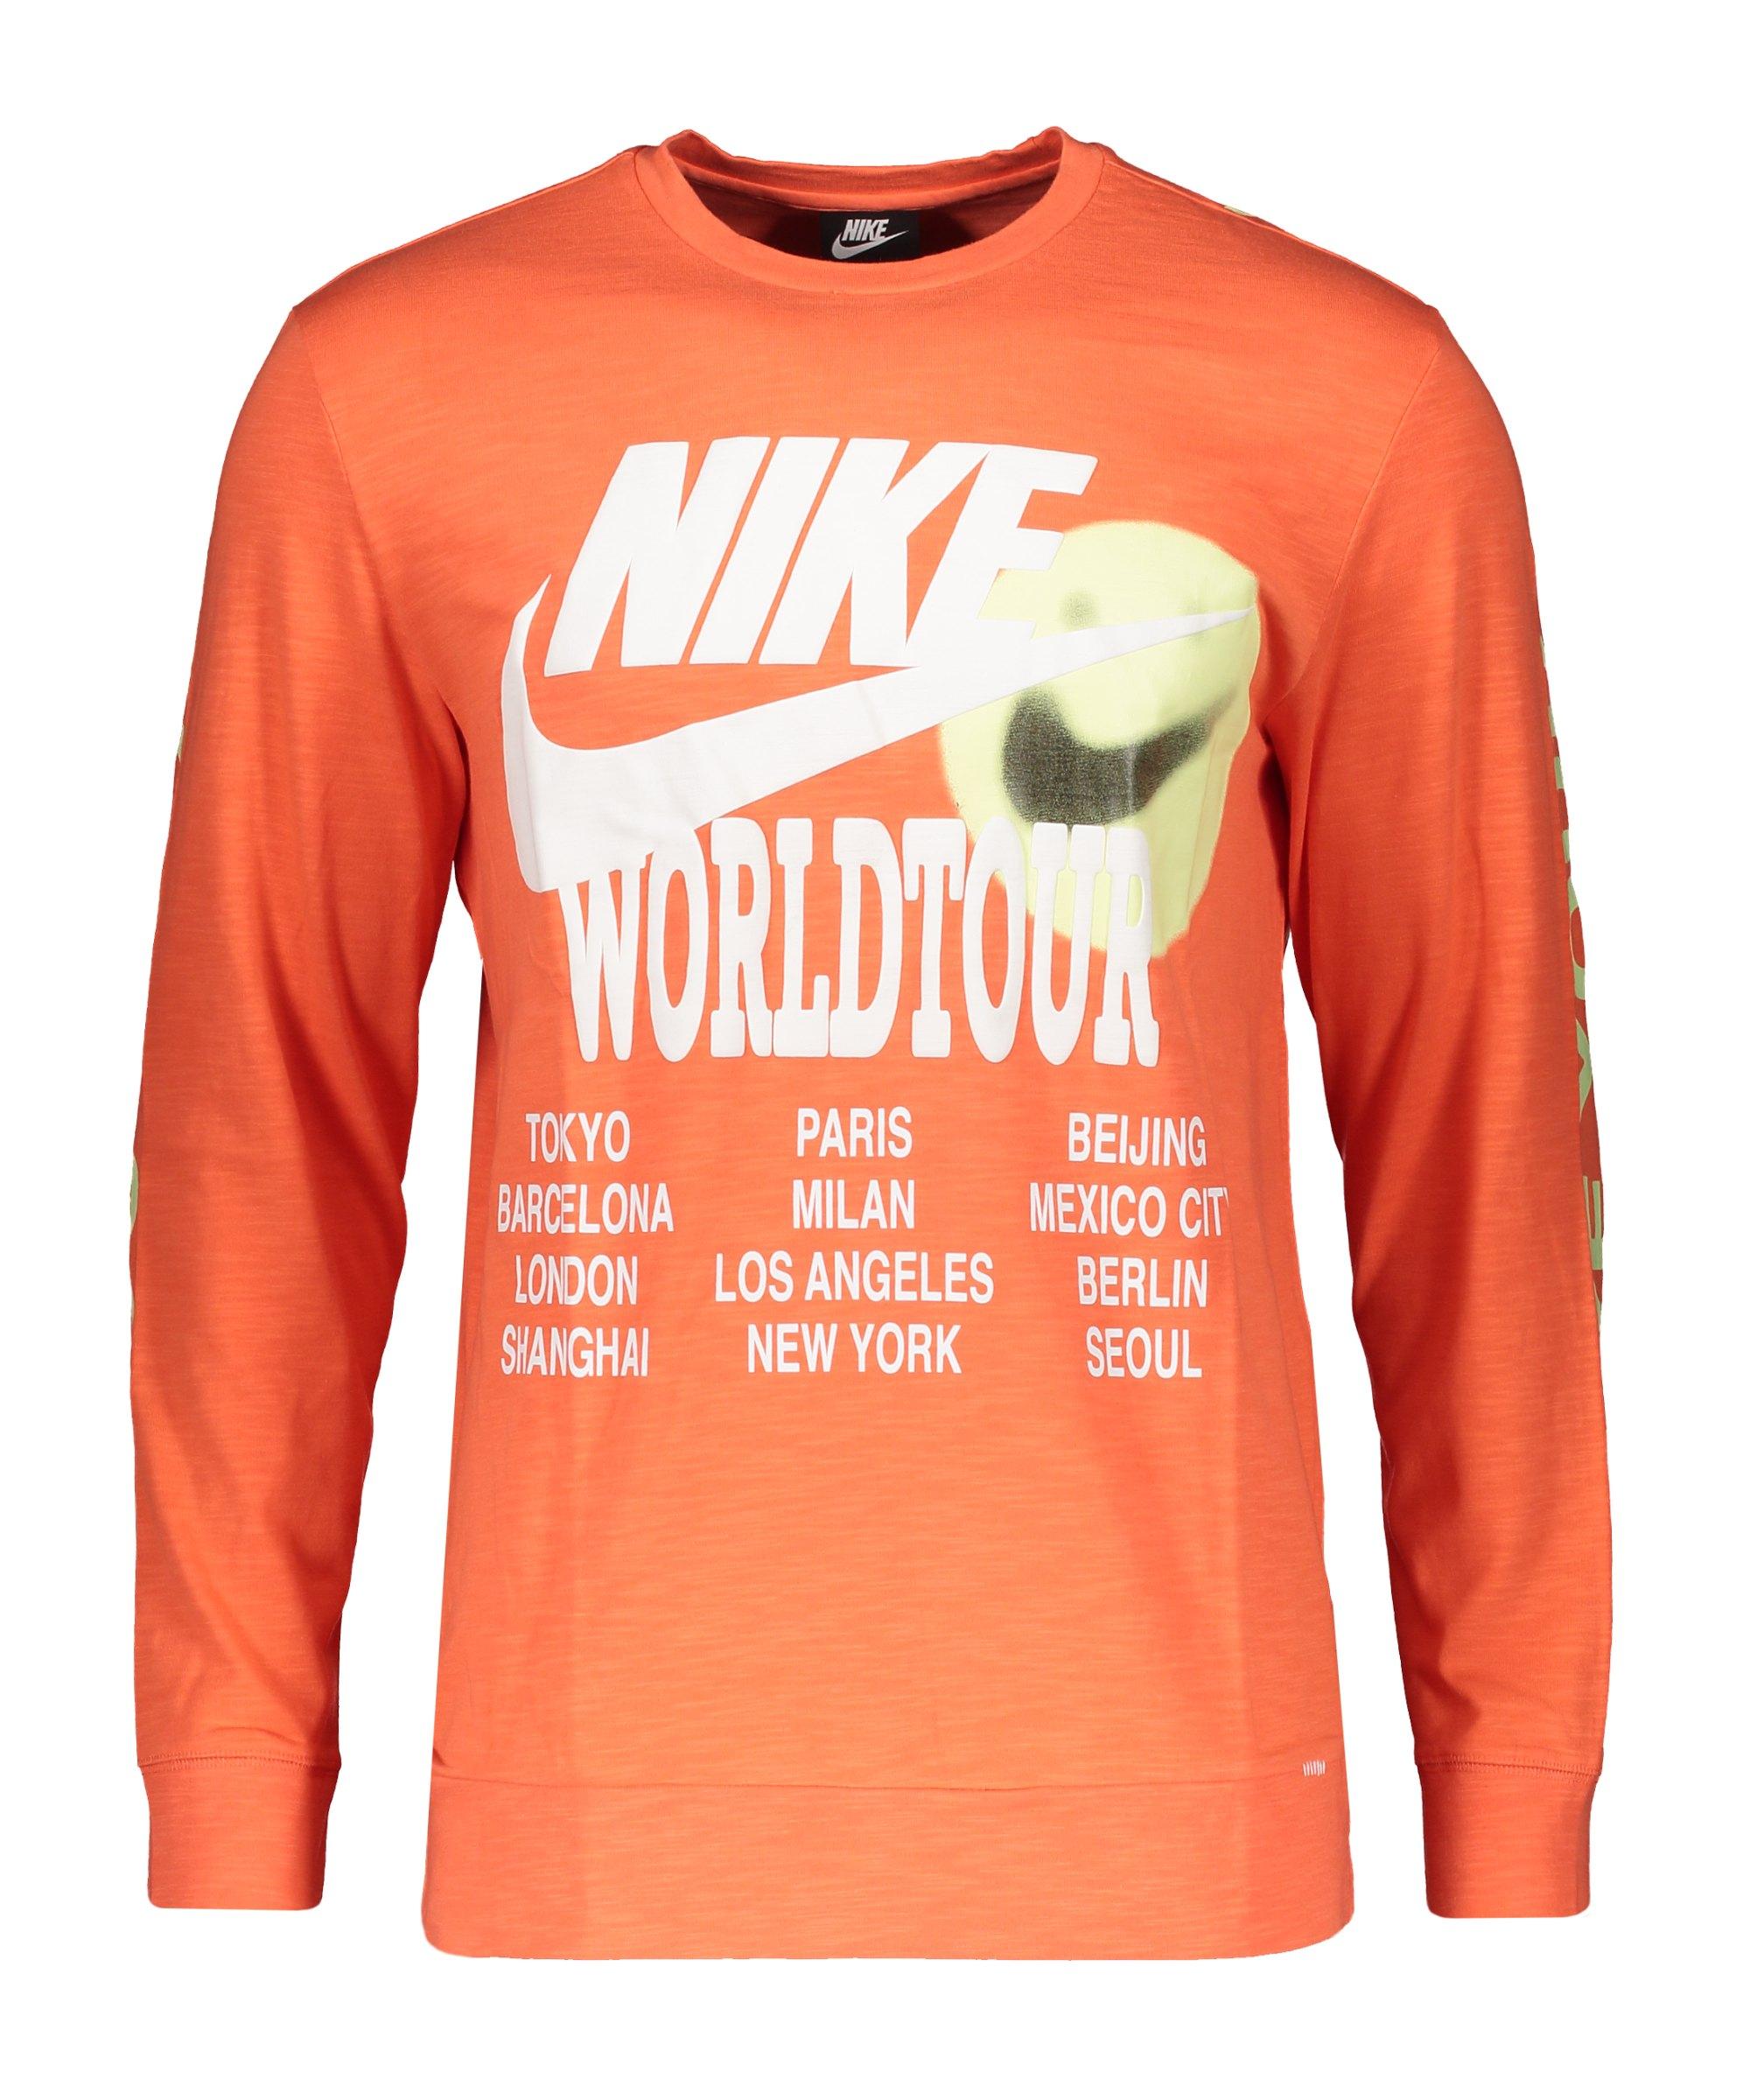 Nike World Wour Sweatshirt Orange F842 - orange